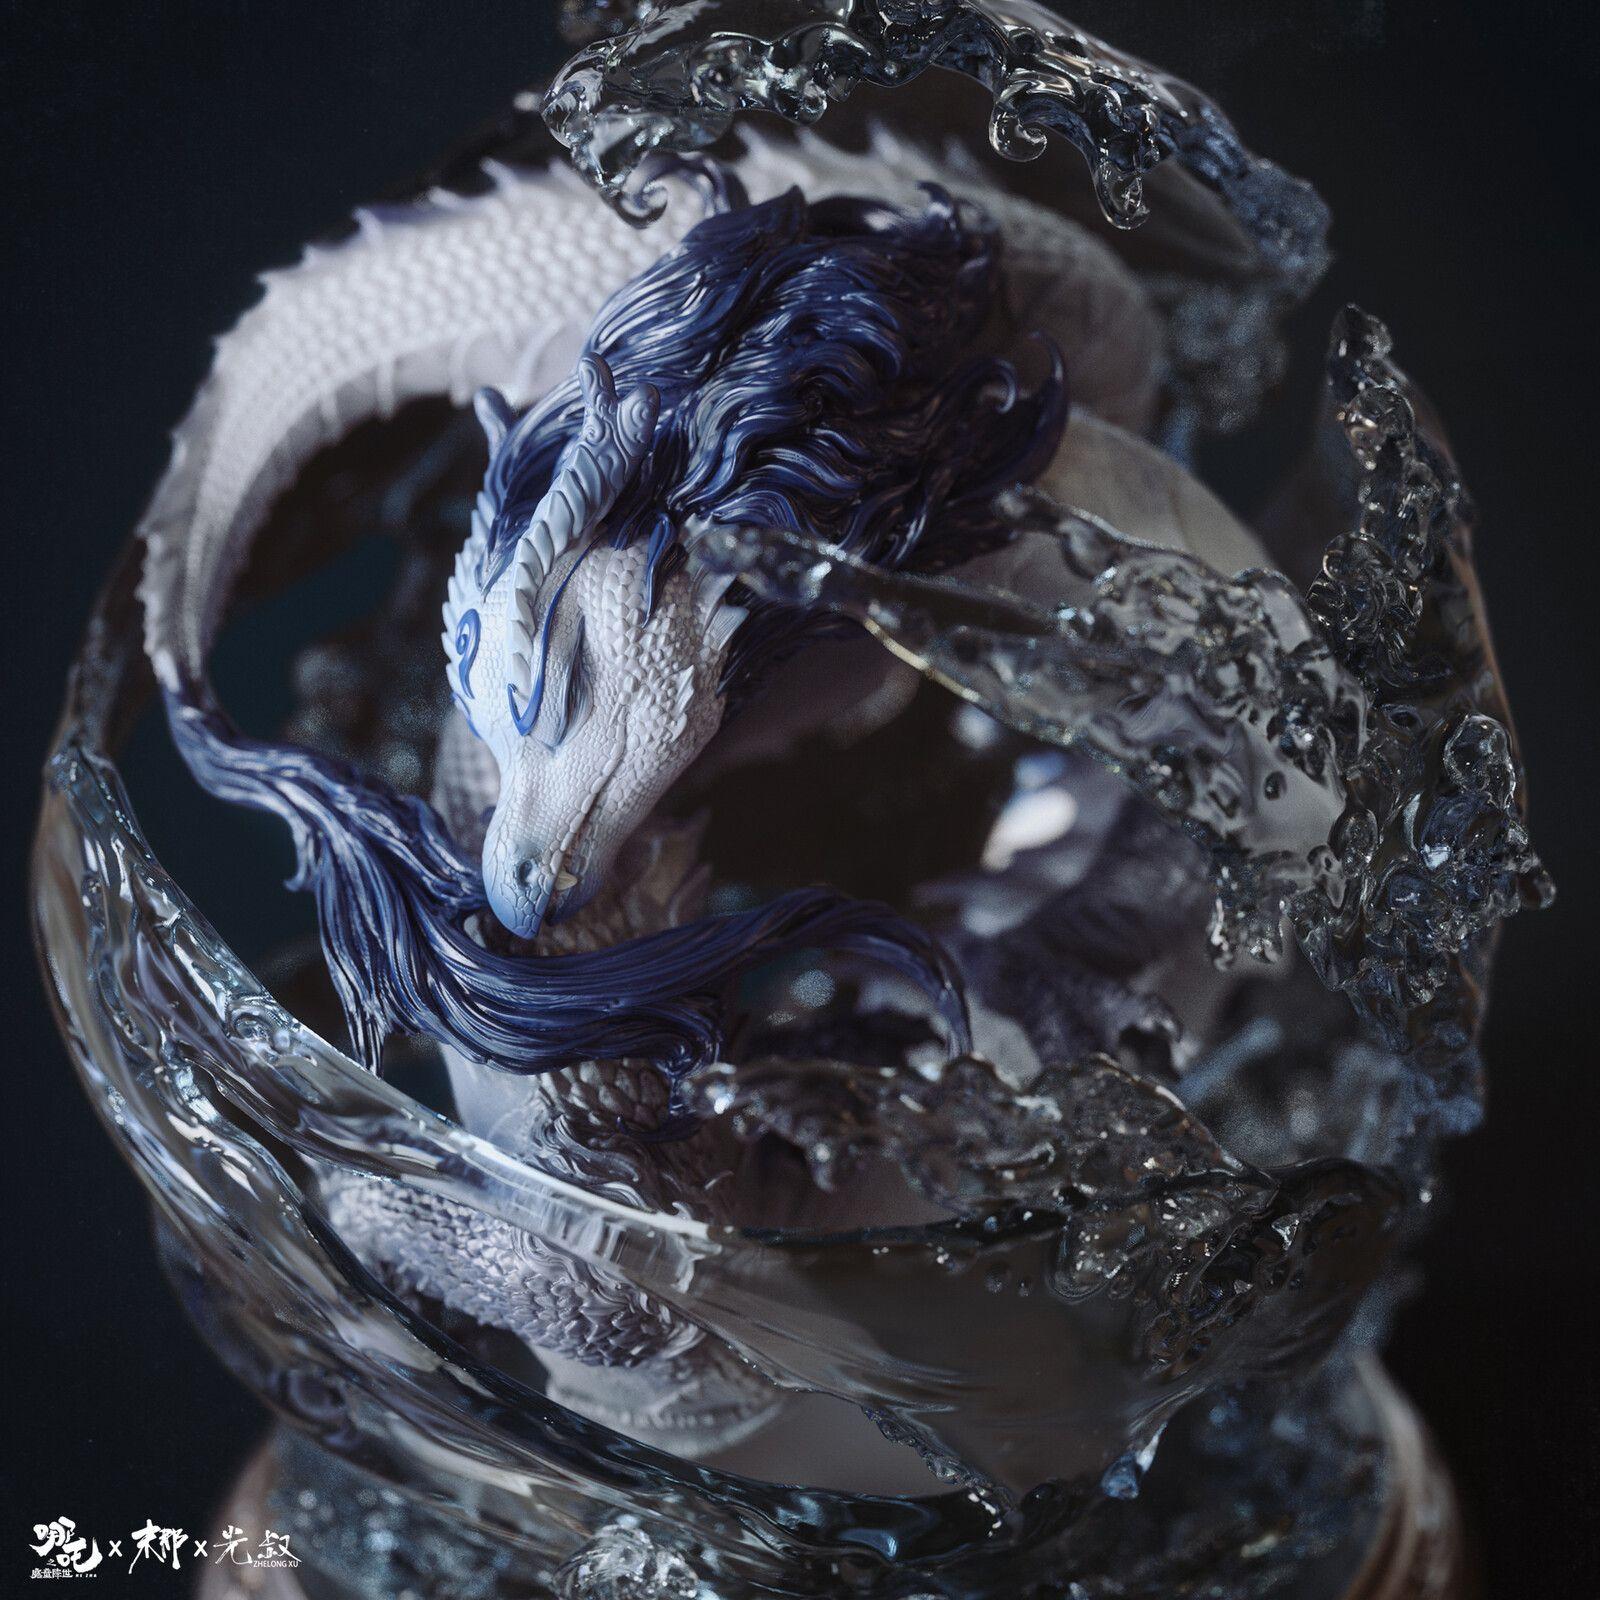 My Bing History: White Dragon Ao Bing -《NeZha》, Zhelong Xu On ArtStation At